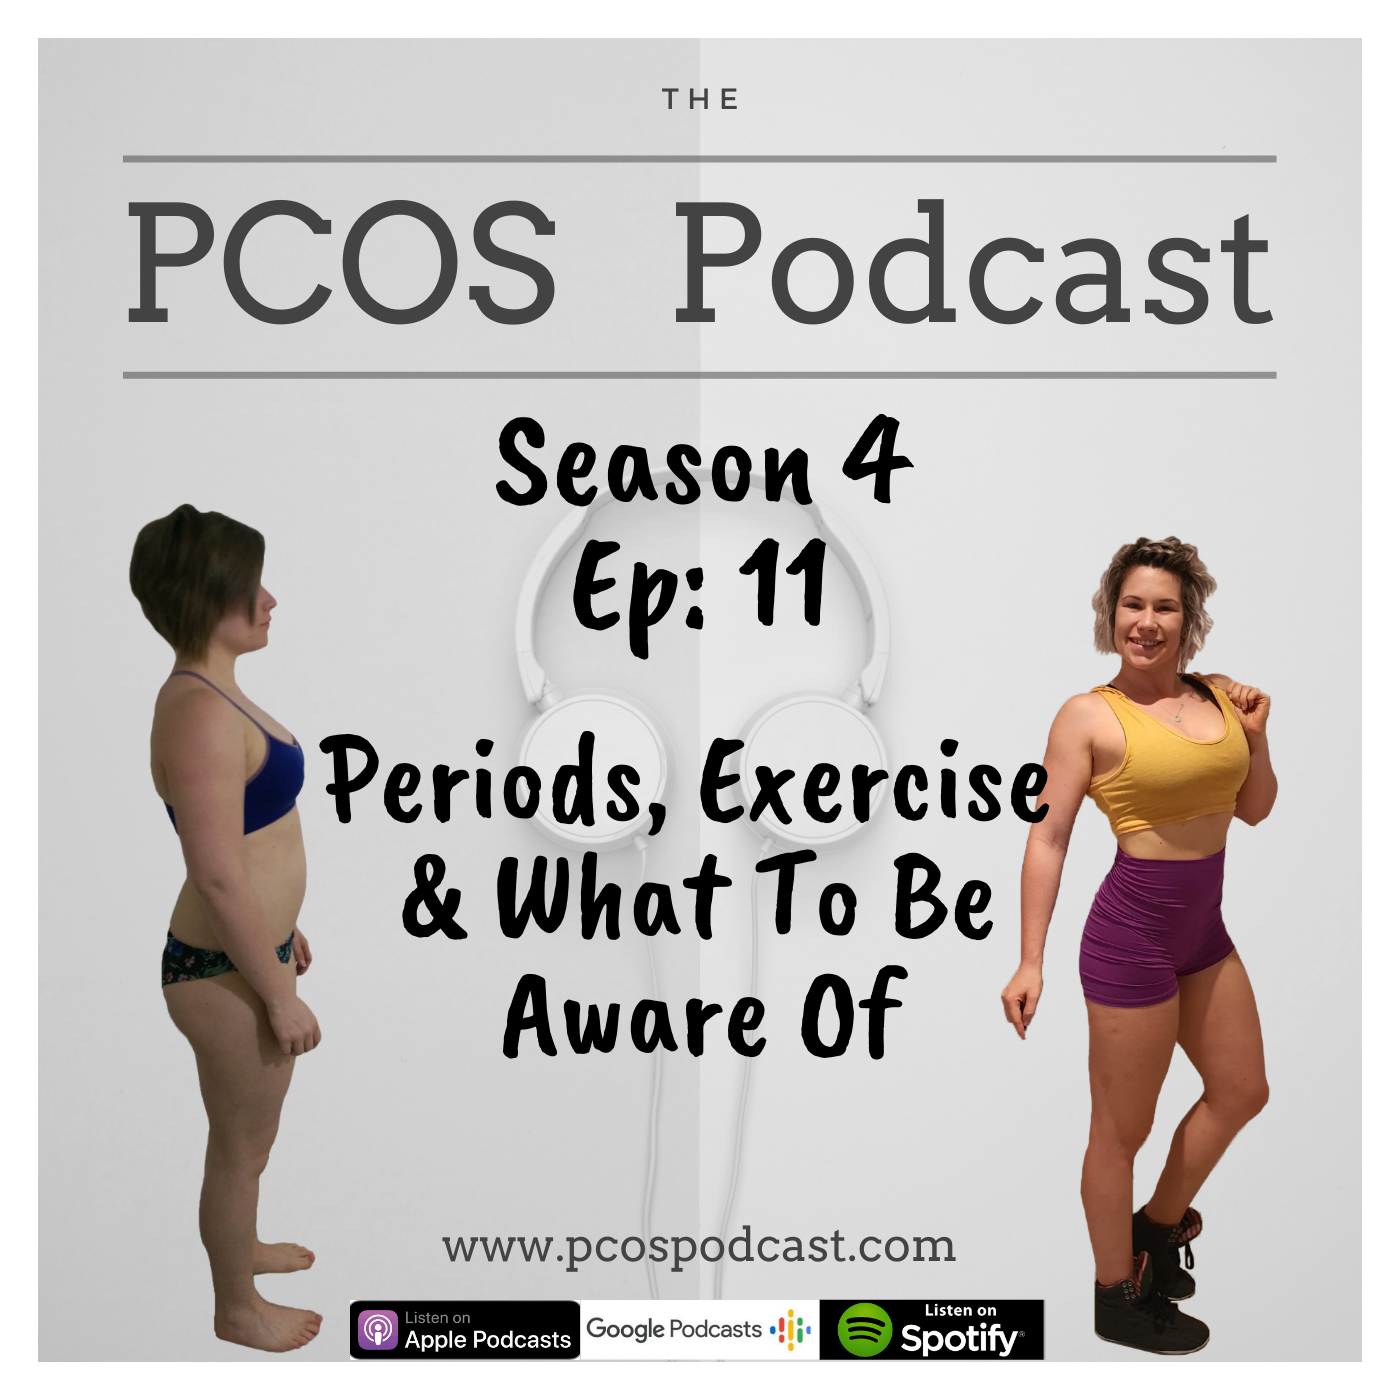 S4 E11 - PeriodsExercise&WhatToBeAwareOf